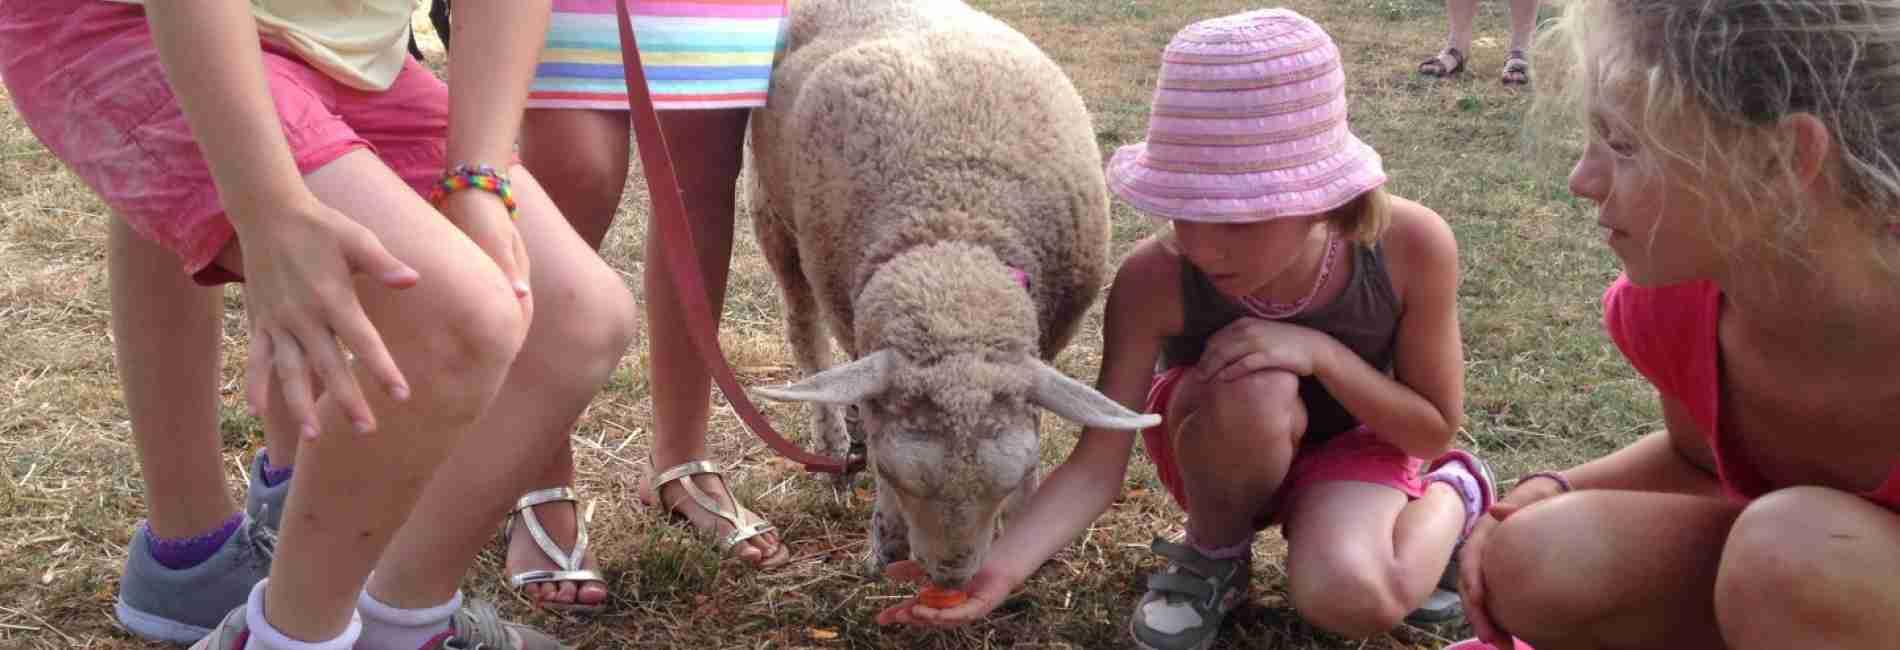 animaux-camping-vacances.jpg